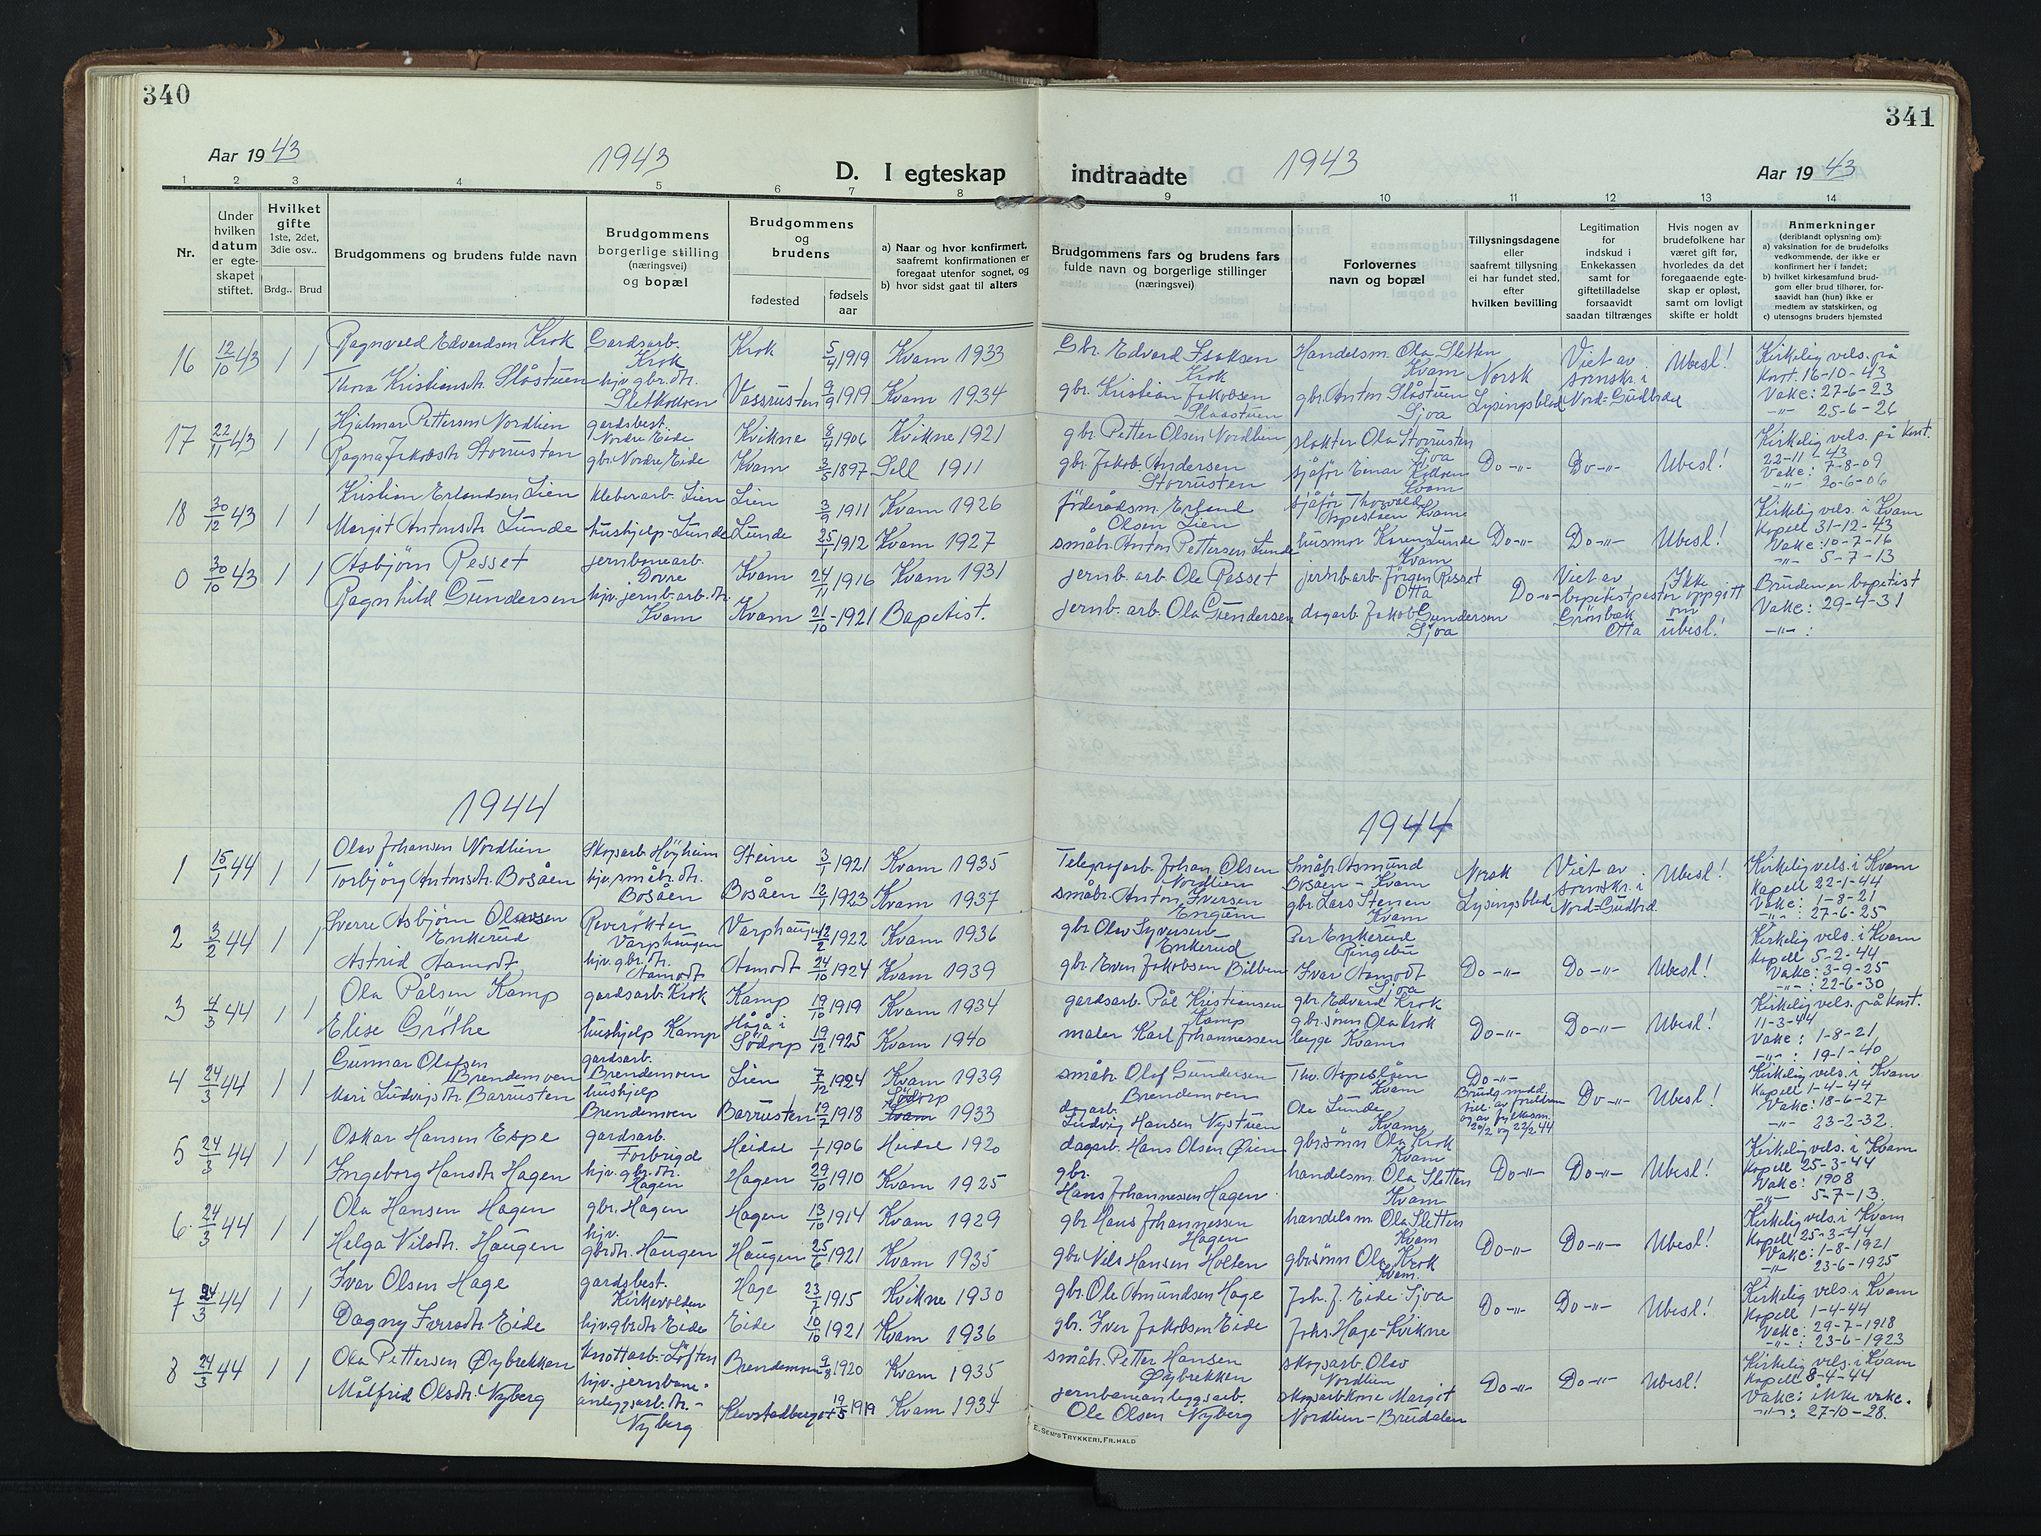 SAH, Nord-Fron prestekontor, Klokkerbok nr. 8, 1915-1948, s. 340-341